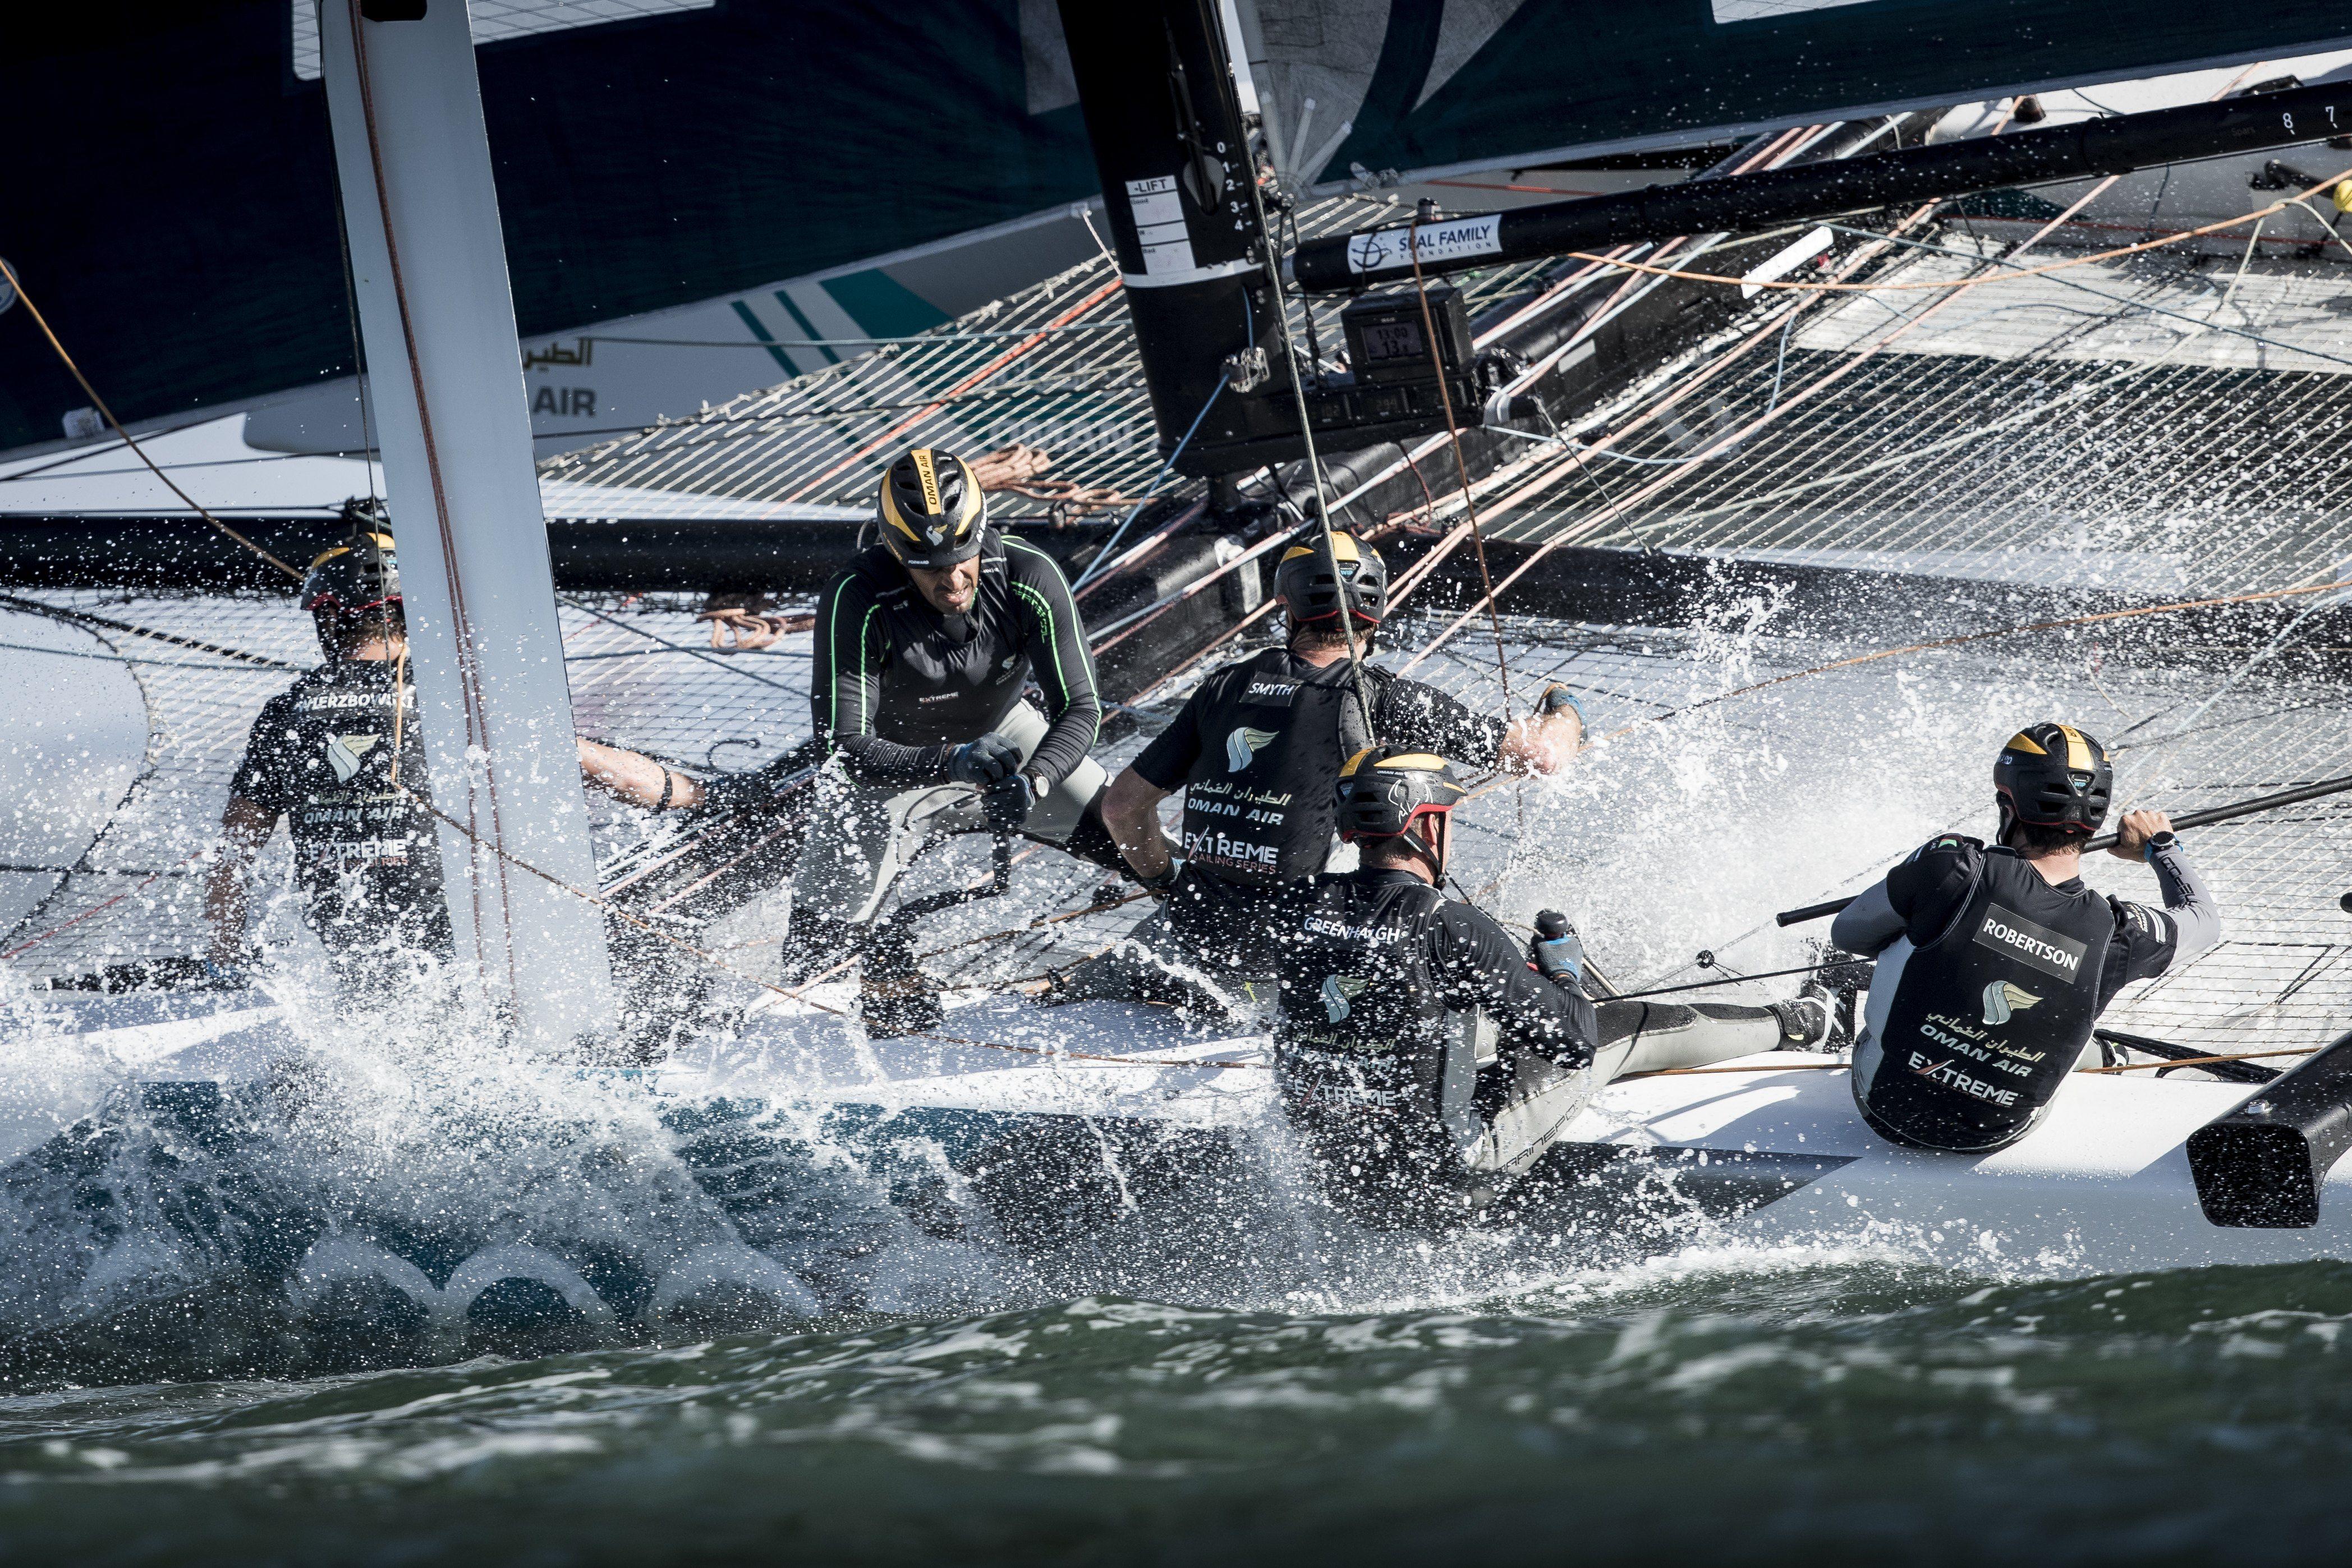 Oman Air's Extreme Sailing Series team keep their grip on a podium place in San Diego